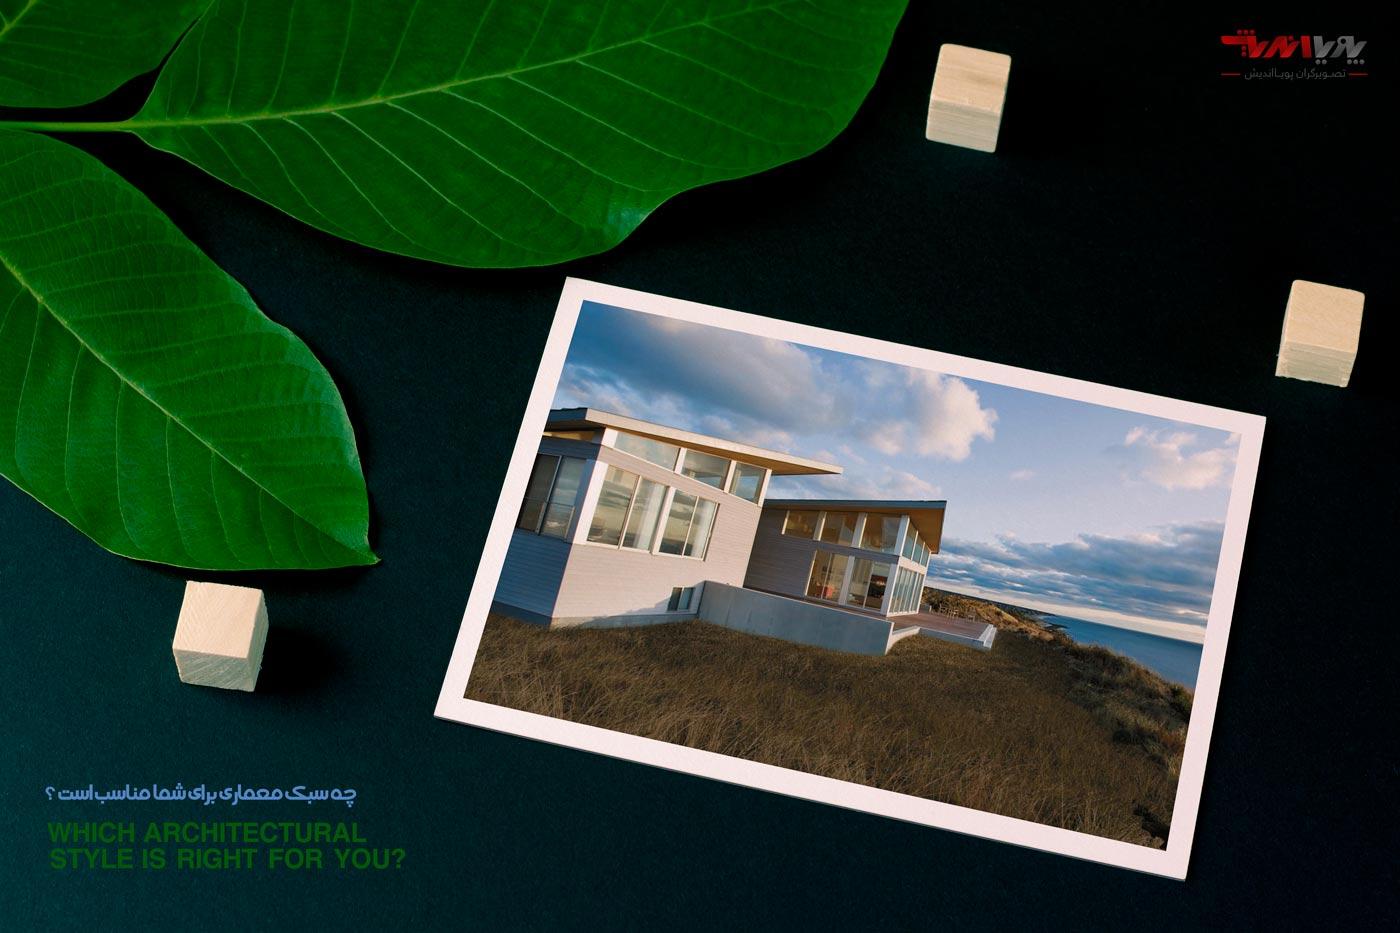 house architecture mockup - چه سبک معماری برای شما مناسب است ؟